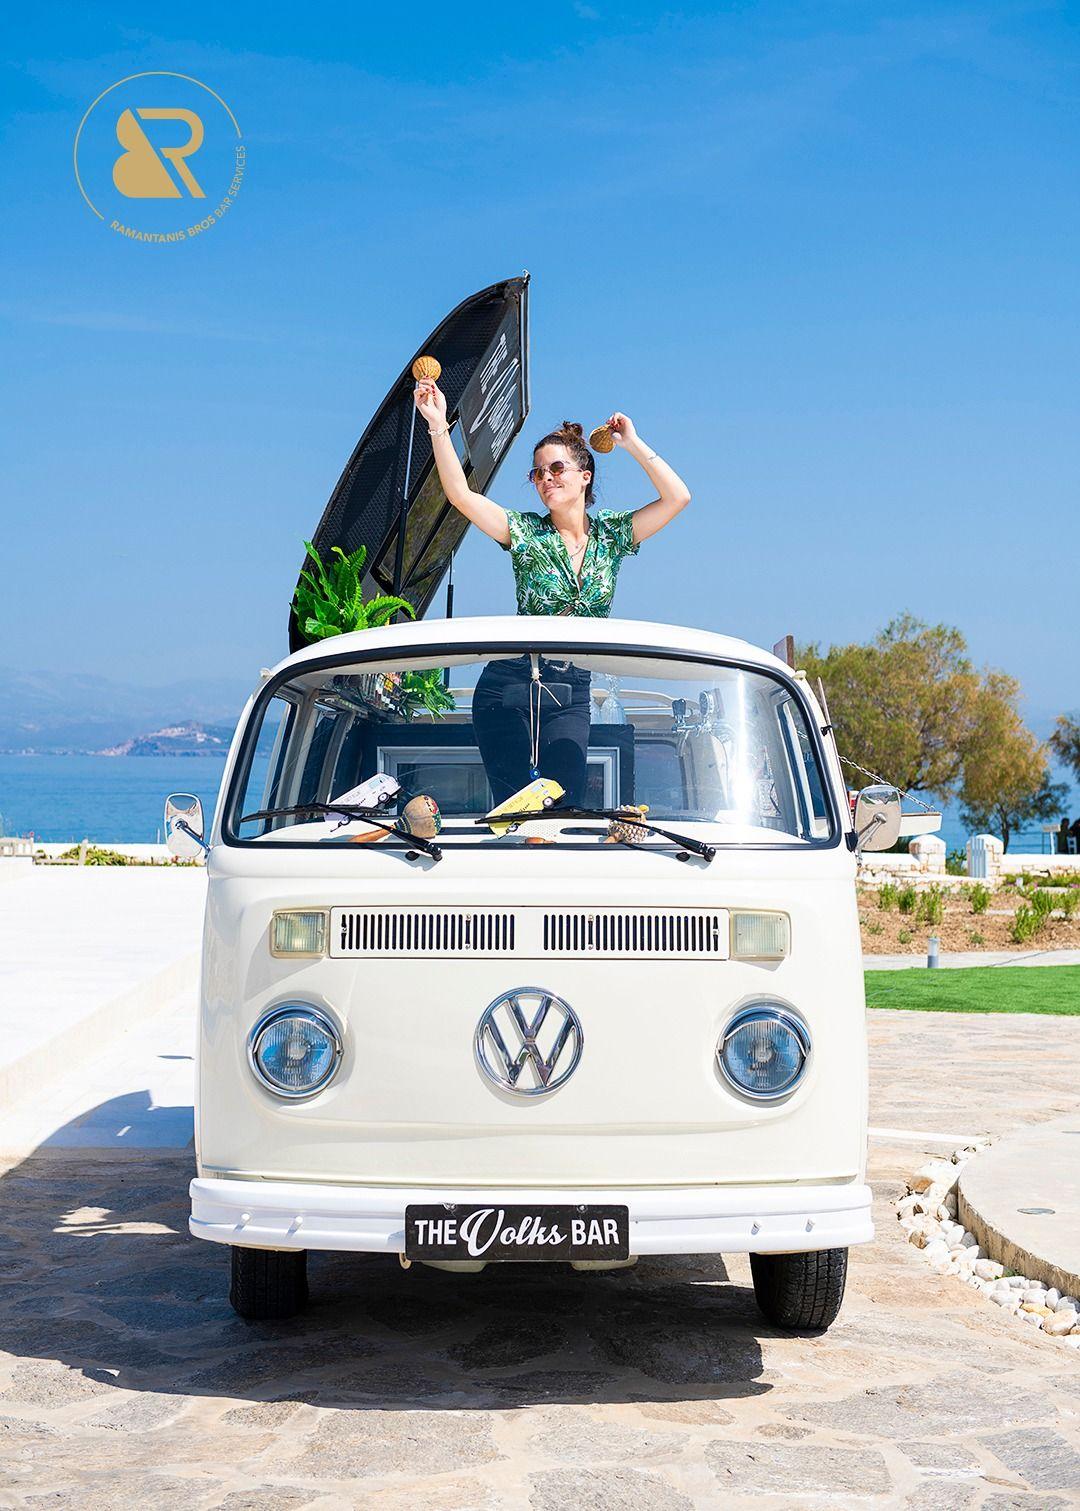 Van Bar For Wedding Theme Wedding In Greece Bar Services Ramantanis Bros Mobile Bar Volkswagen Models Bar Service